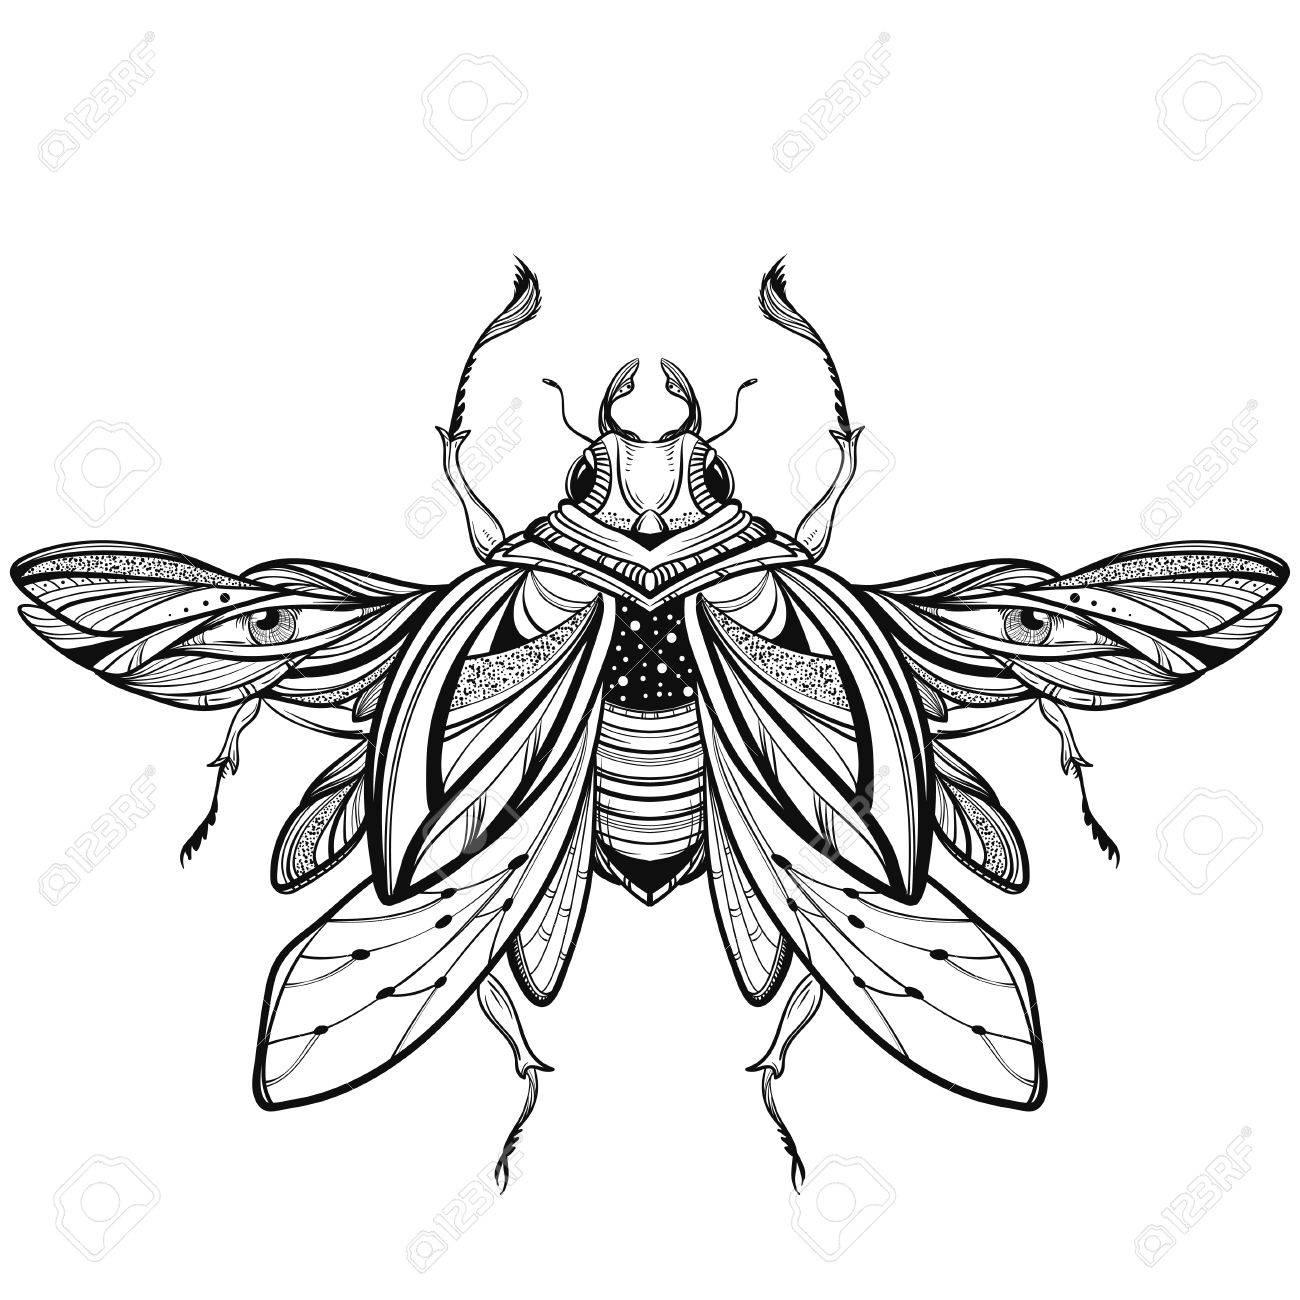 Egyptian Scarab Beetle Drawing At Getdrawings